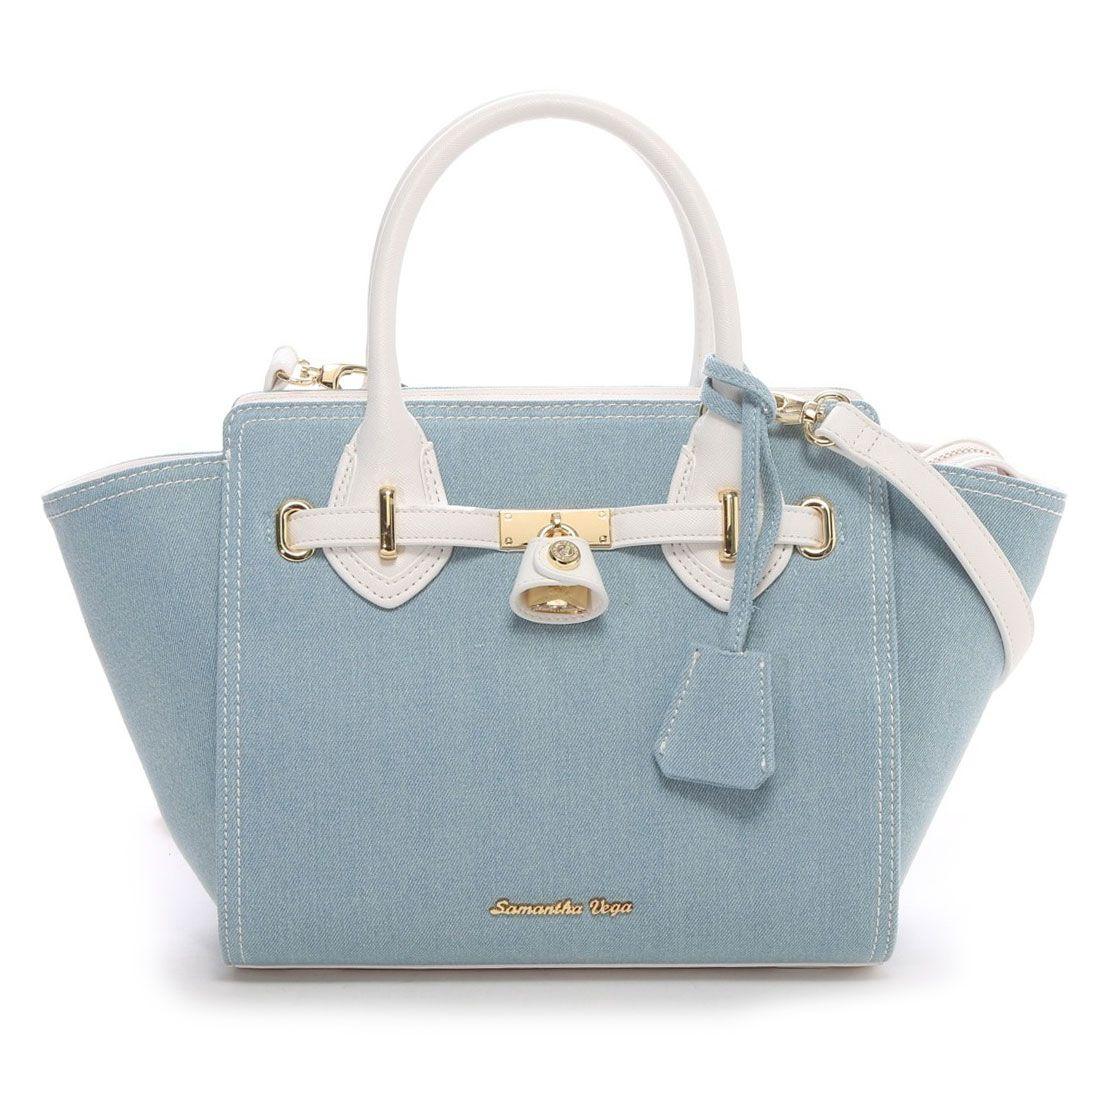 31b508be9428 Samantha Thavasa サマンサベガ デニムバチェロ 小(ライトブルー) -靴とファッションの通販サイト